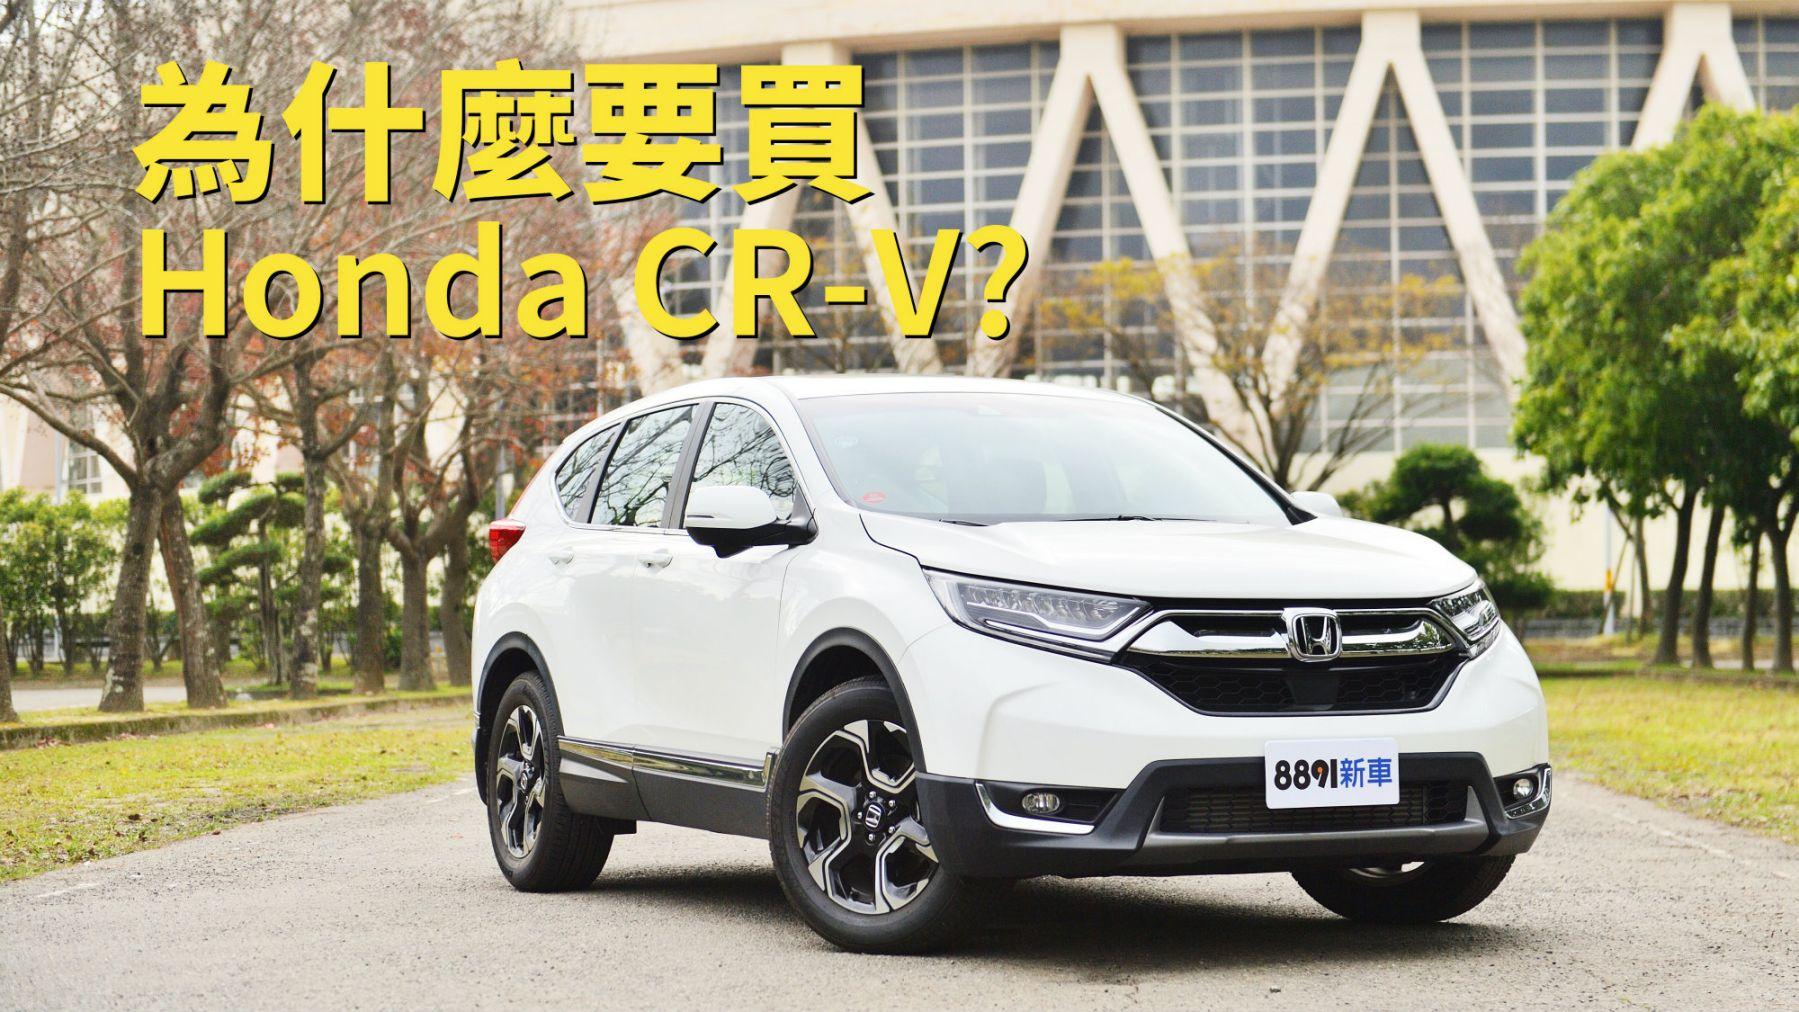 為什麼要買Honda CR-V?《 Why Buy? 》Vol.03